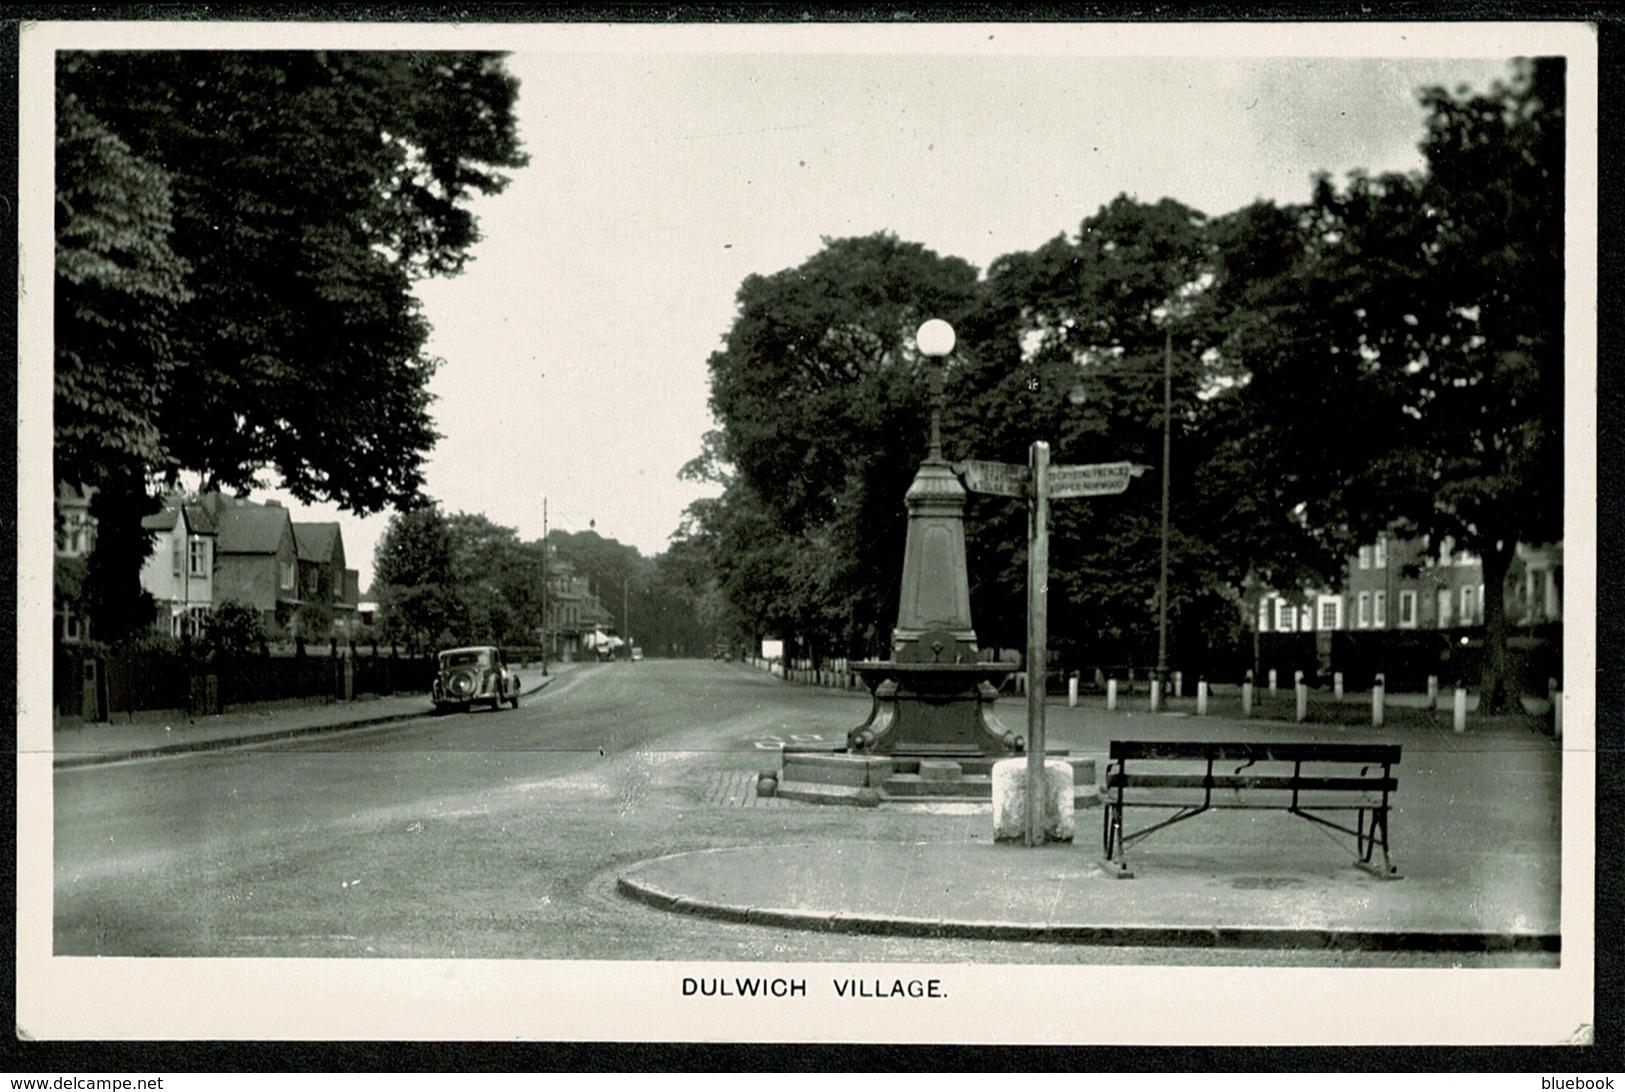 Ref 1247 - 1949 Real Photo Postcard - Dulwich Village & Finger Signpost - London - London Suburbs